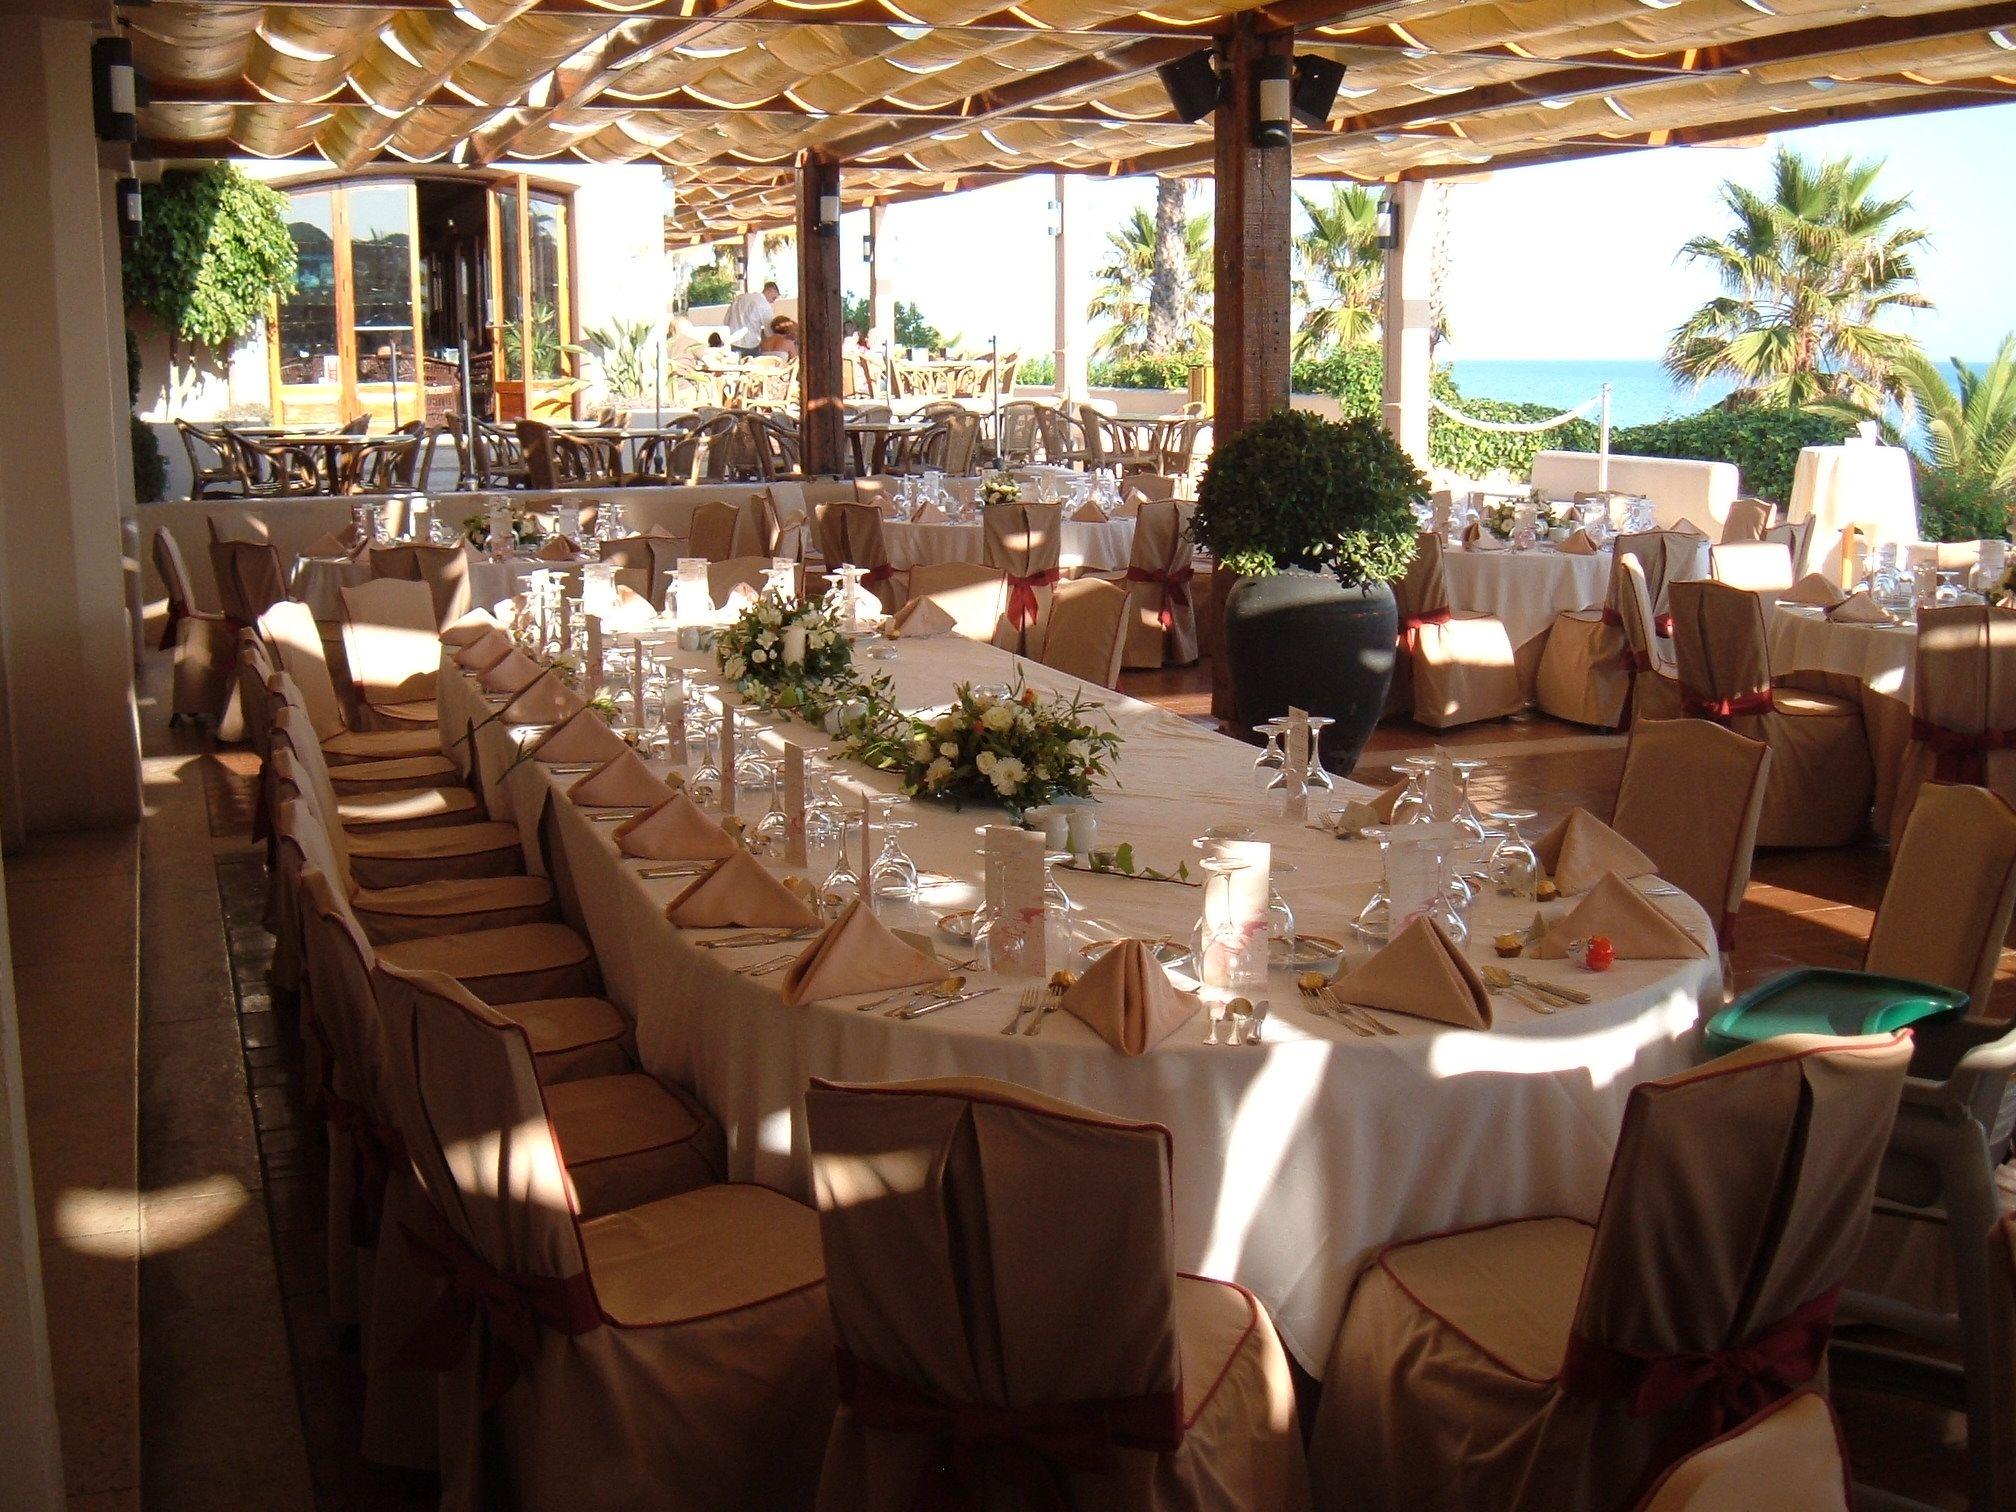 Luxury Wedding Venue With Private Beach: Amazing Beach Front Reception Venue By Algarve Wedding